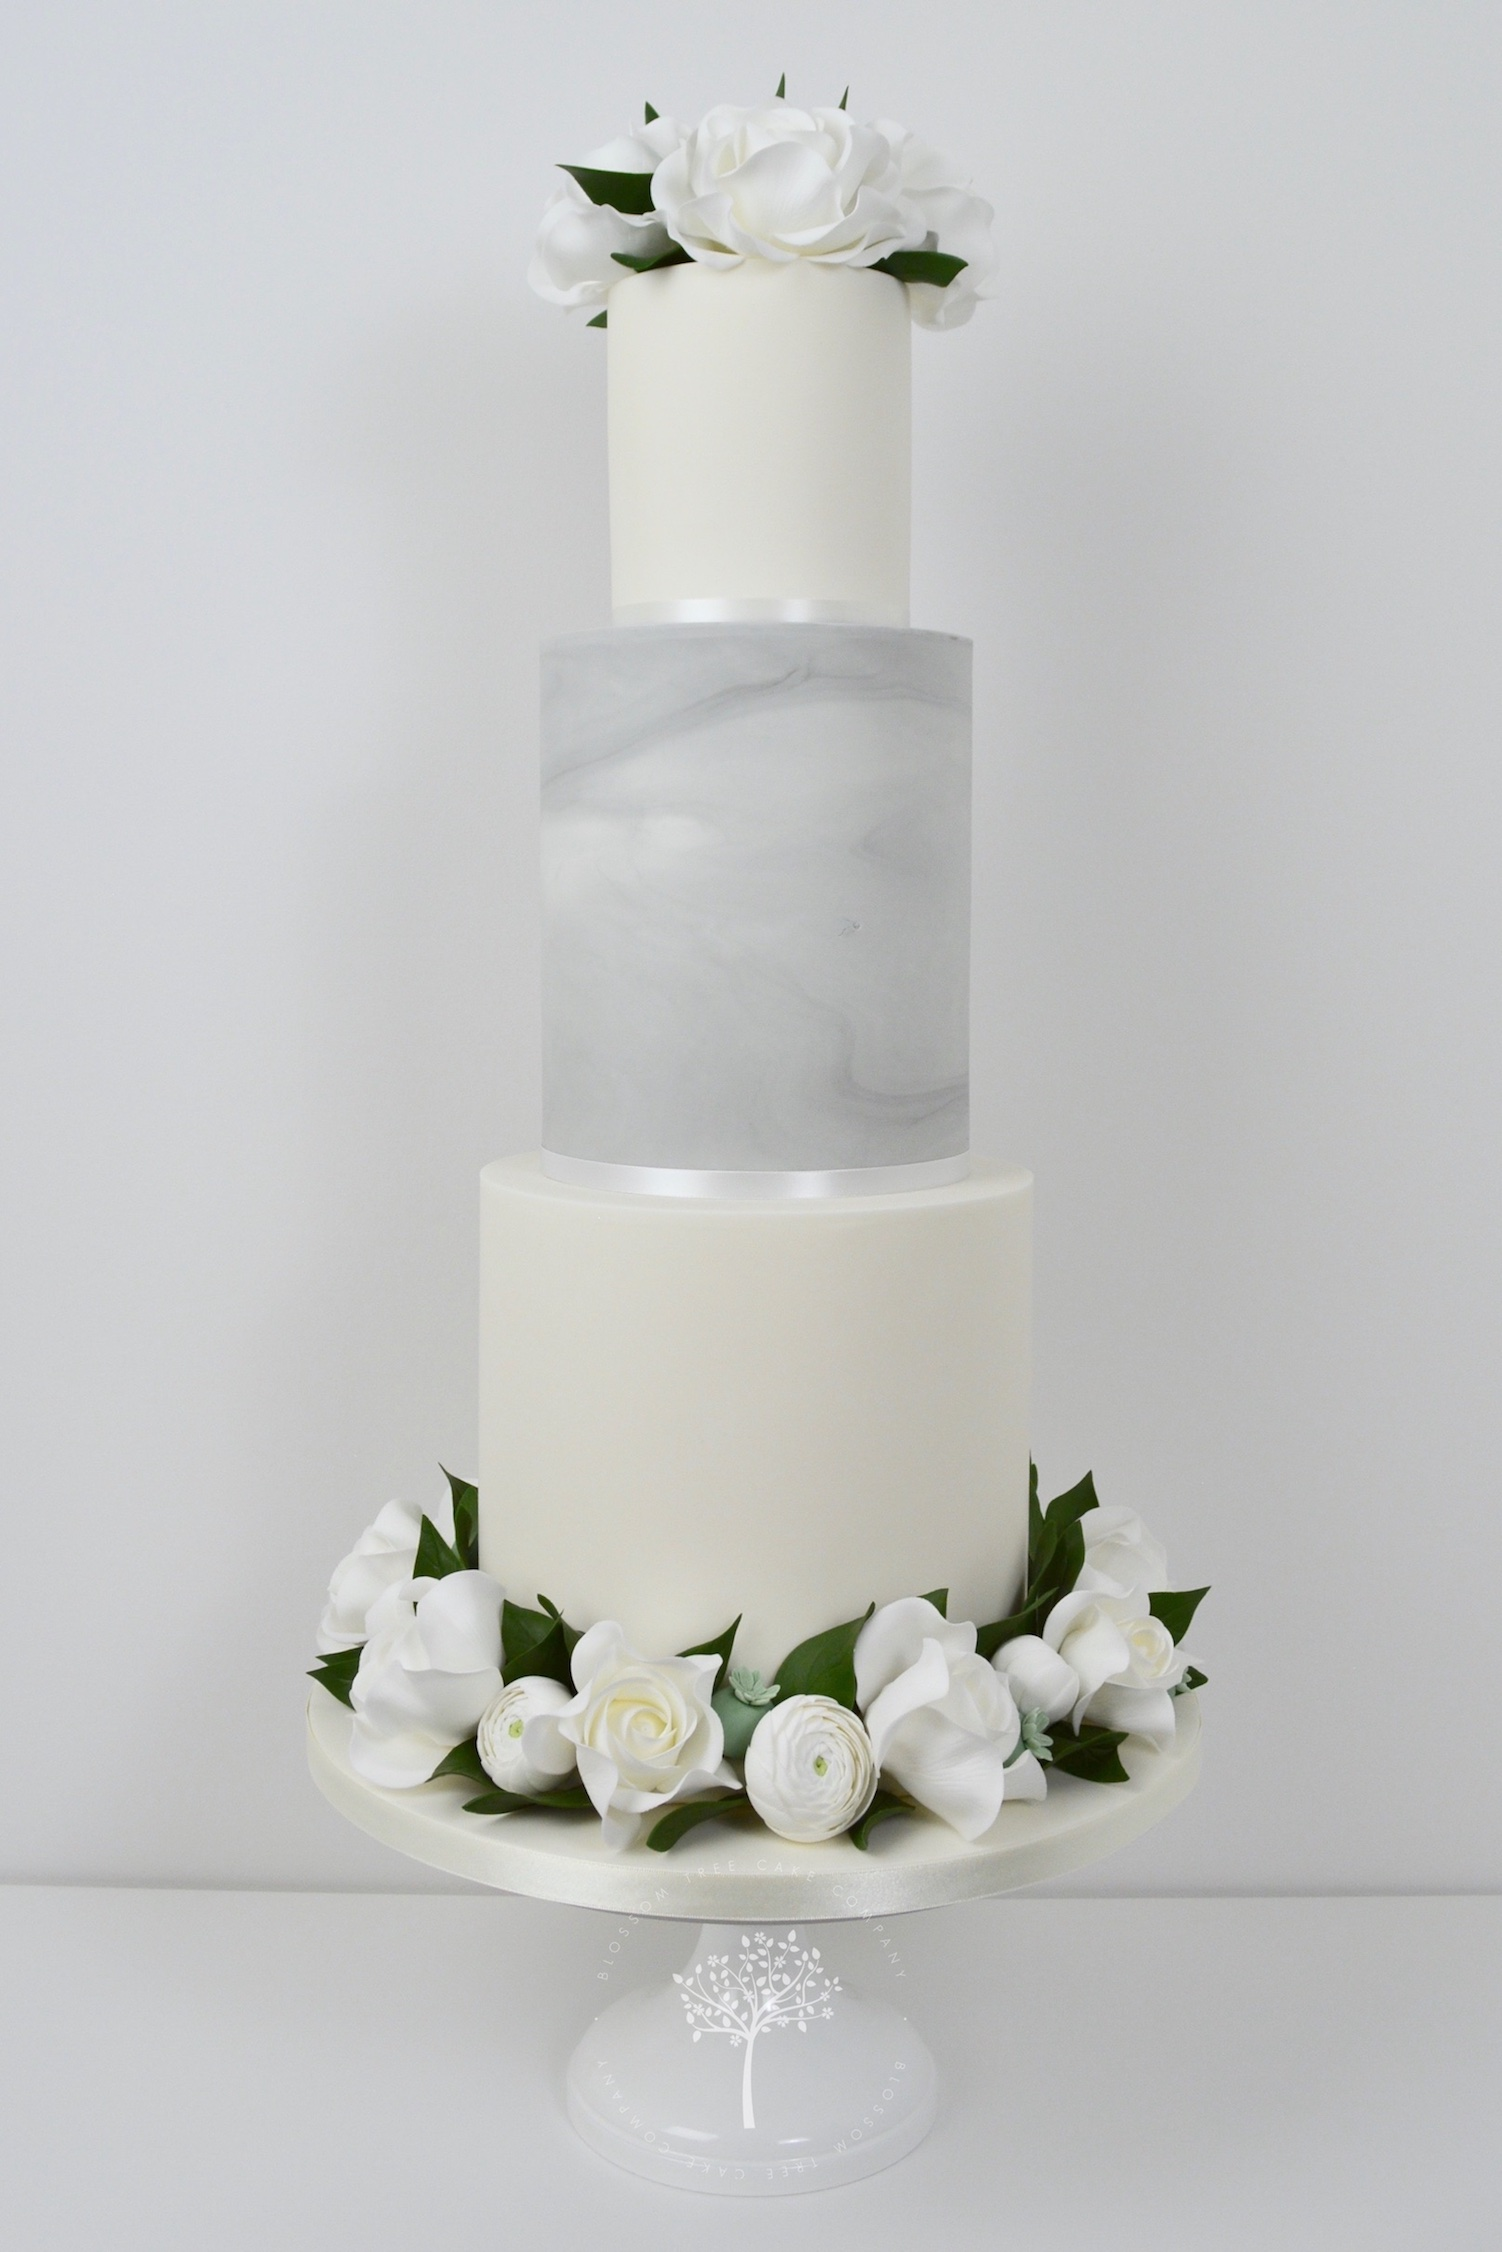 White Roses and Ranunculus wedding cake by Blossom Tree Cake Company Harrogate North Yorkshire.jpg